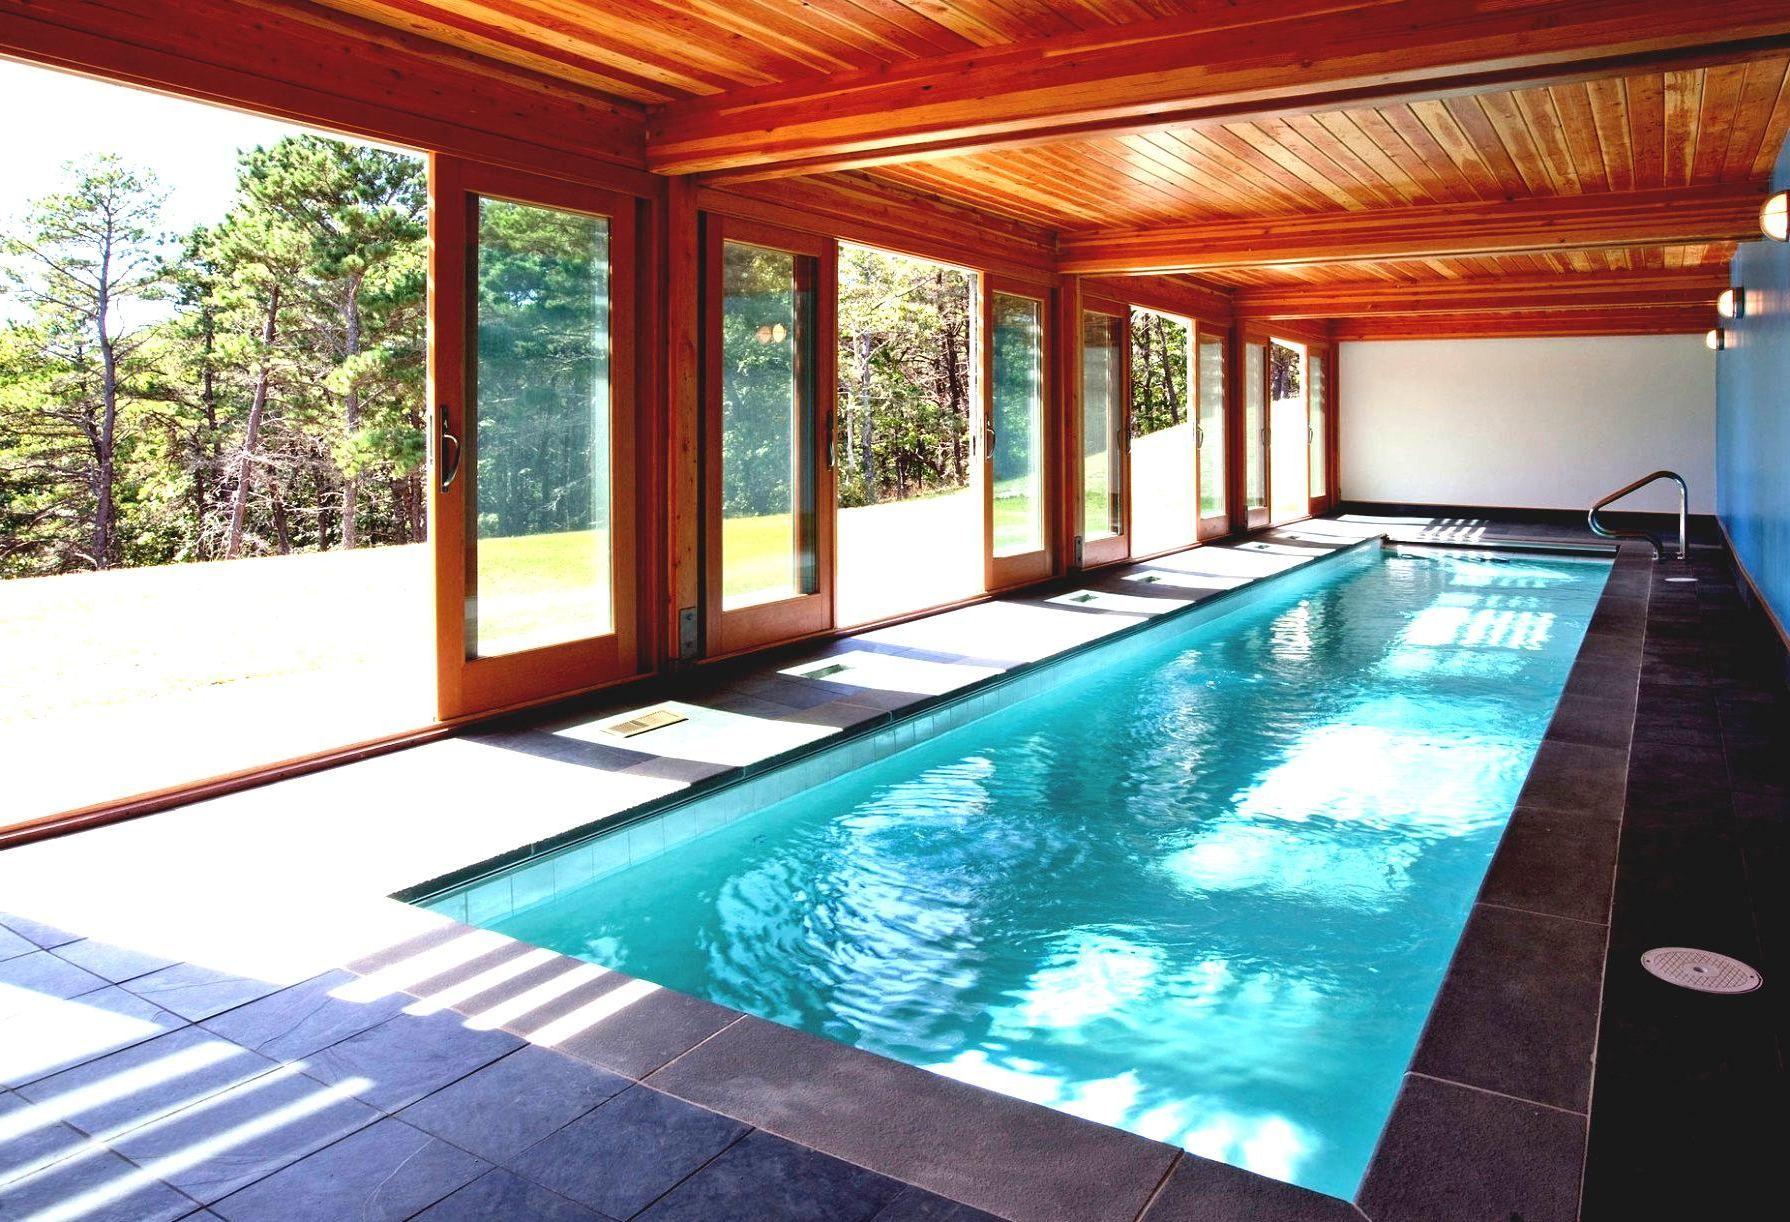 Indoor swimming pool \u2013 Steven Gerrard Mansion house plans ...